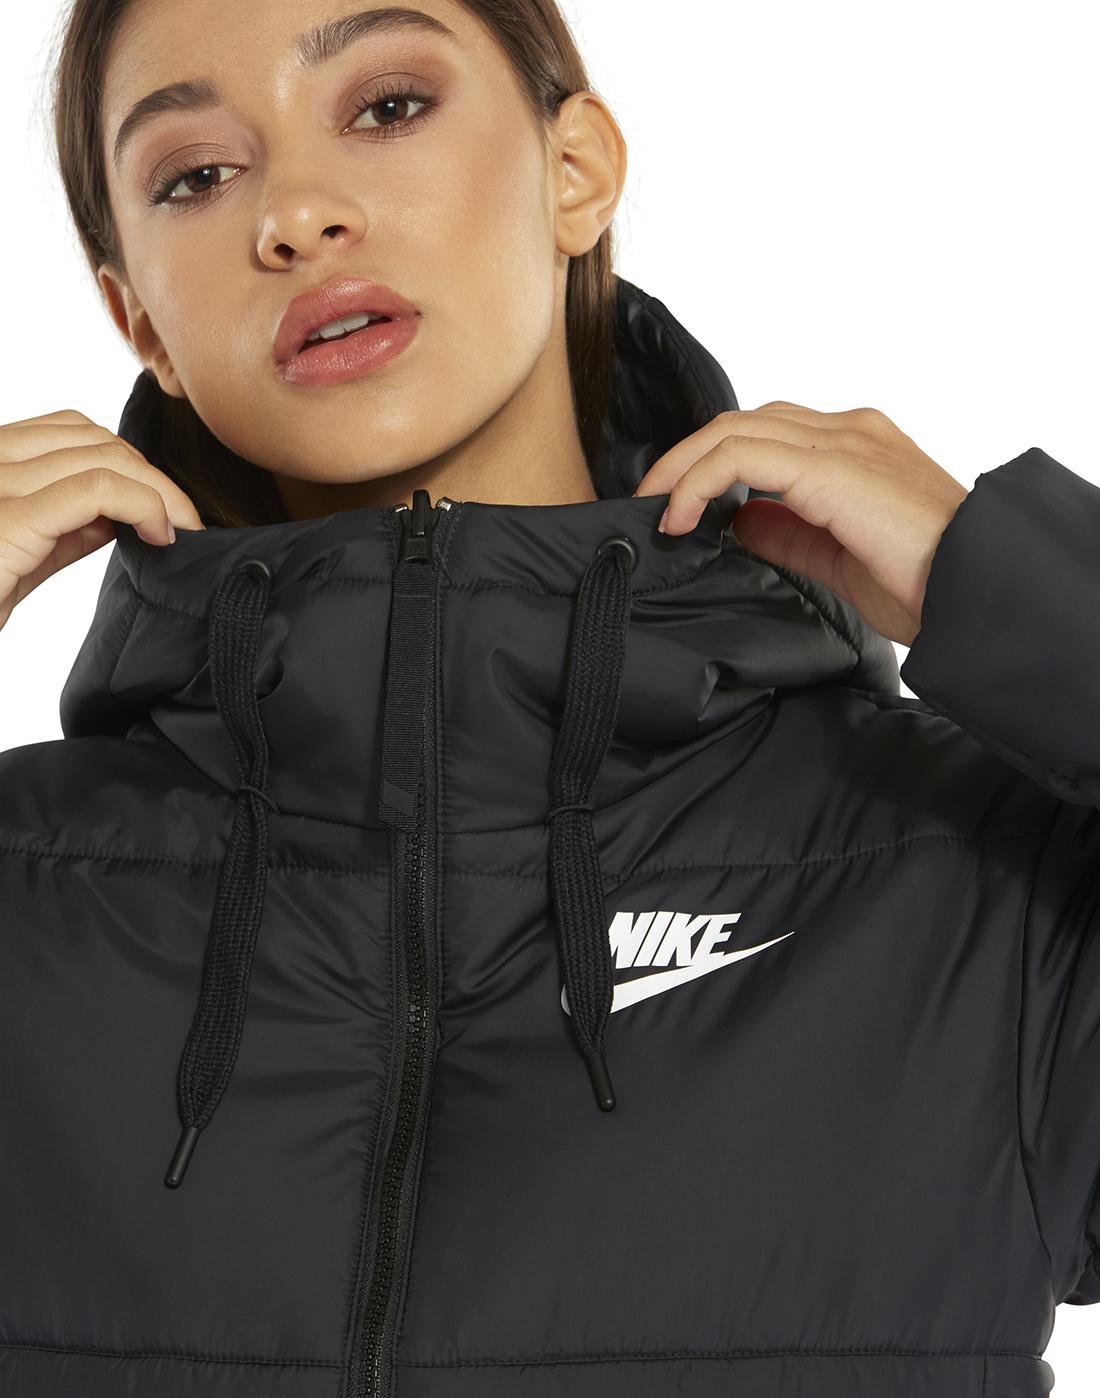 670f08c64a0c Women s Black Nike Reversible Padded Jacket